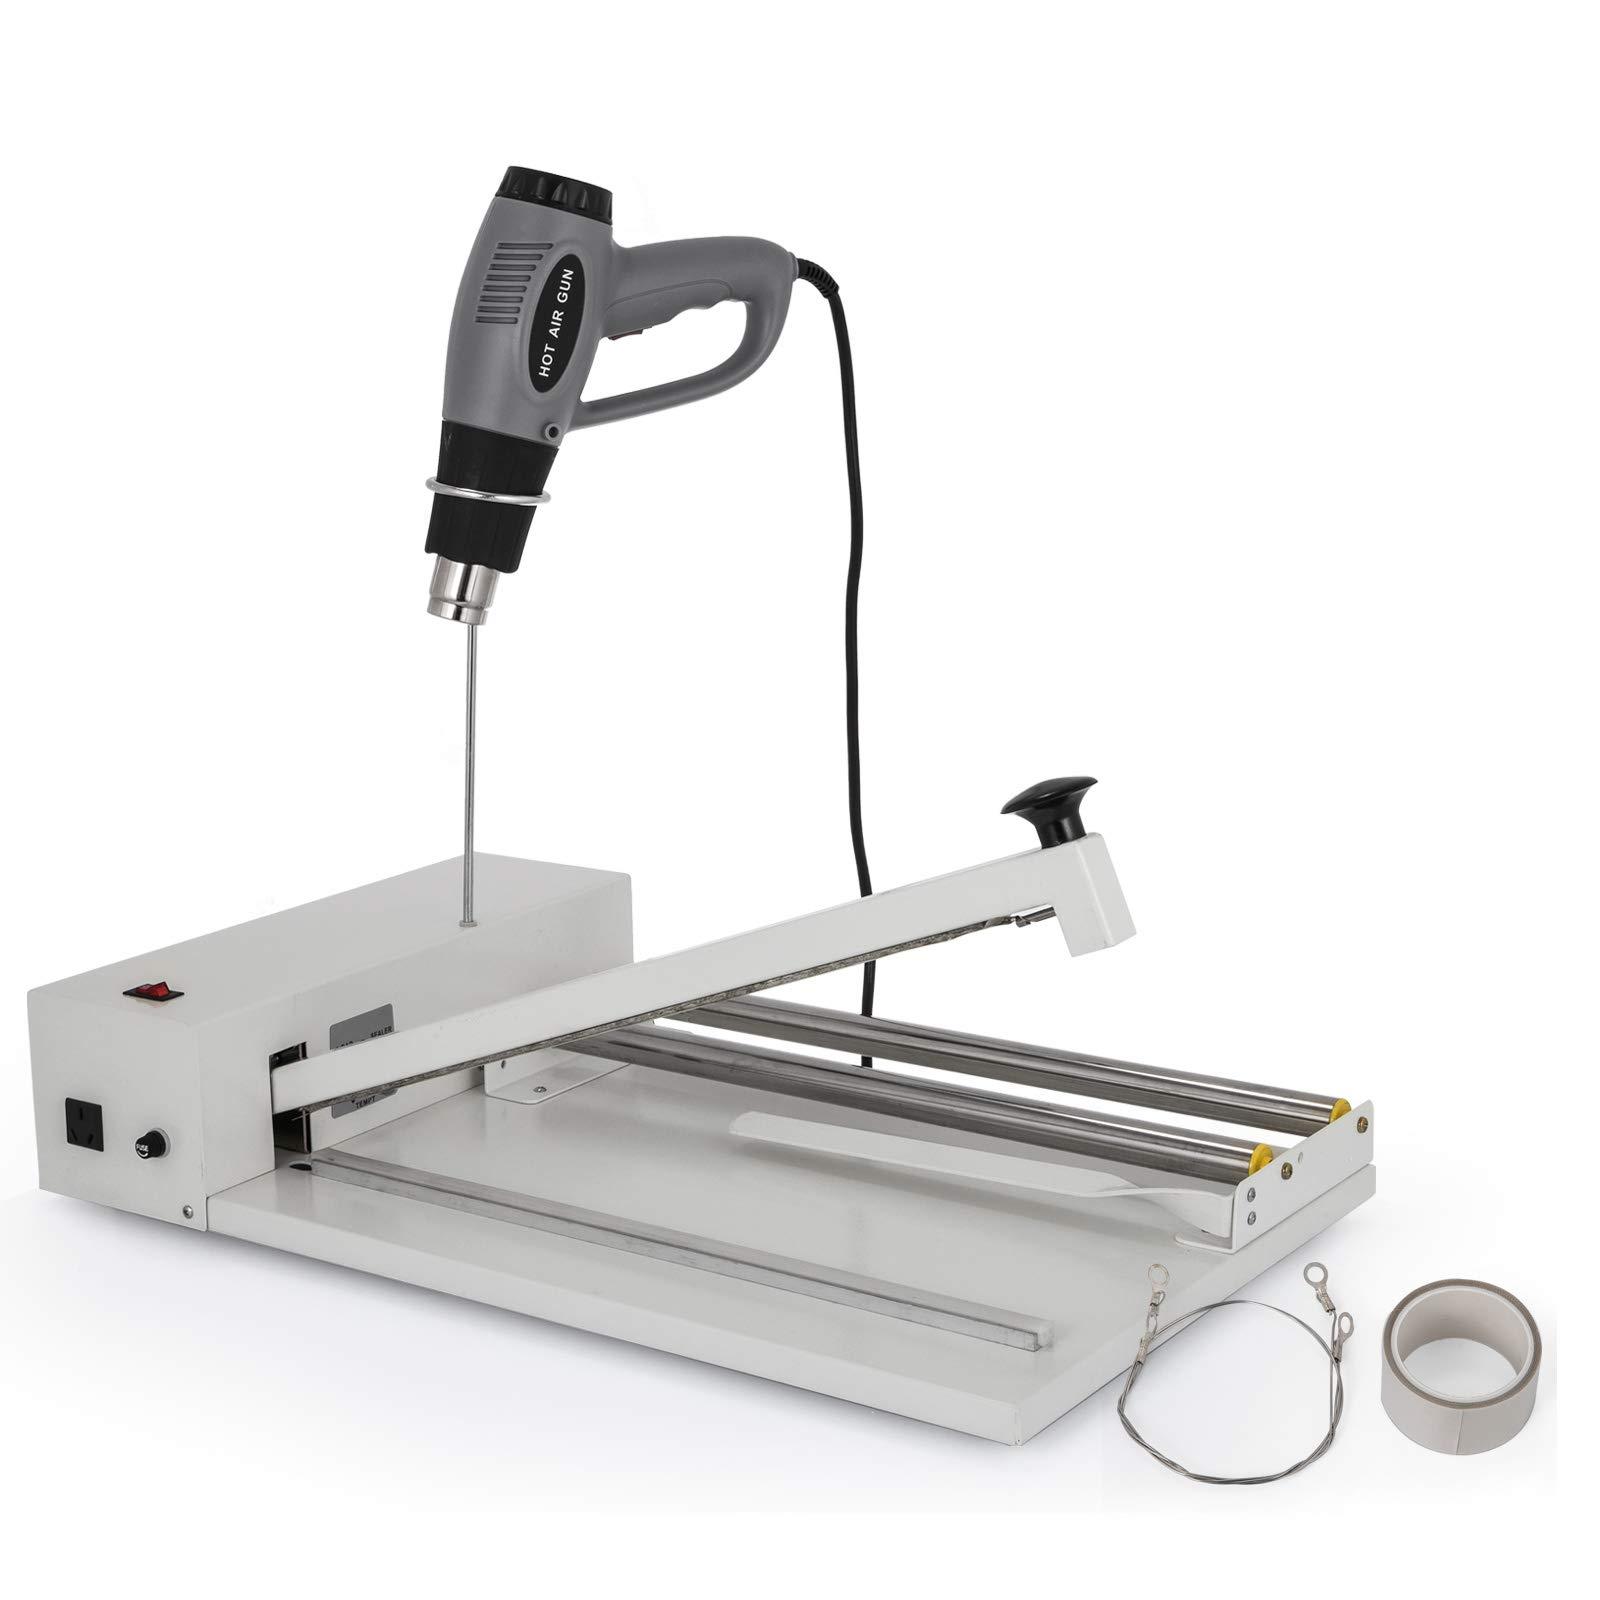 VEVOR 24'' I-Bar Shrink Wrap Machine with Heat Gun I-bar Sealer Compatible with PVC POF Film Shrink Wrap Sealer for Home Commercial Use (24 Inch)